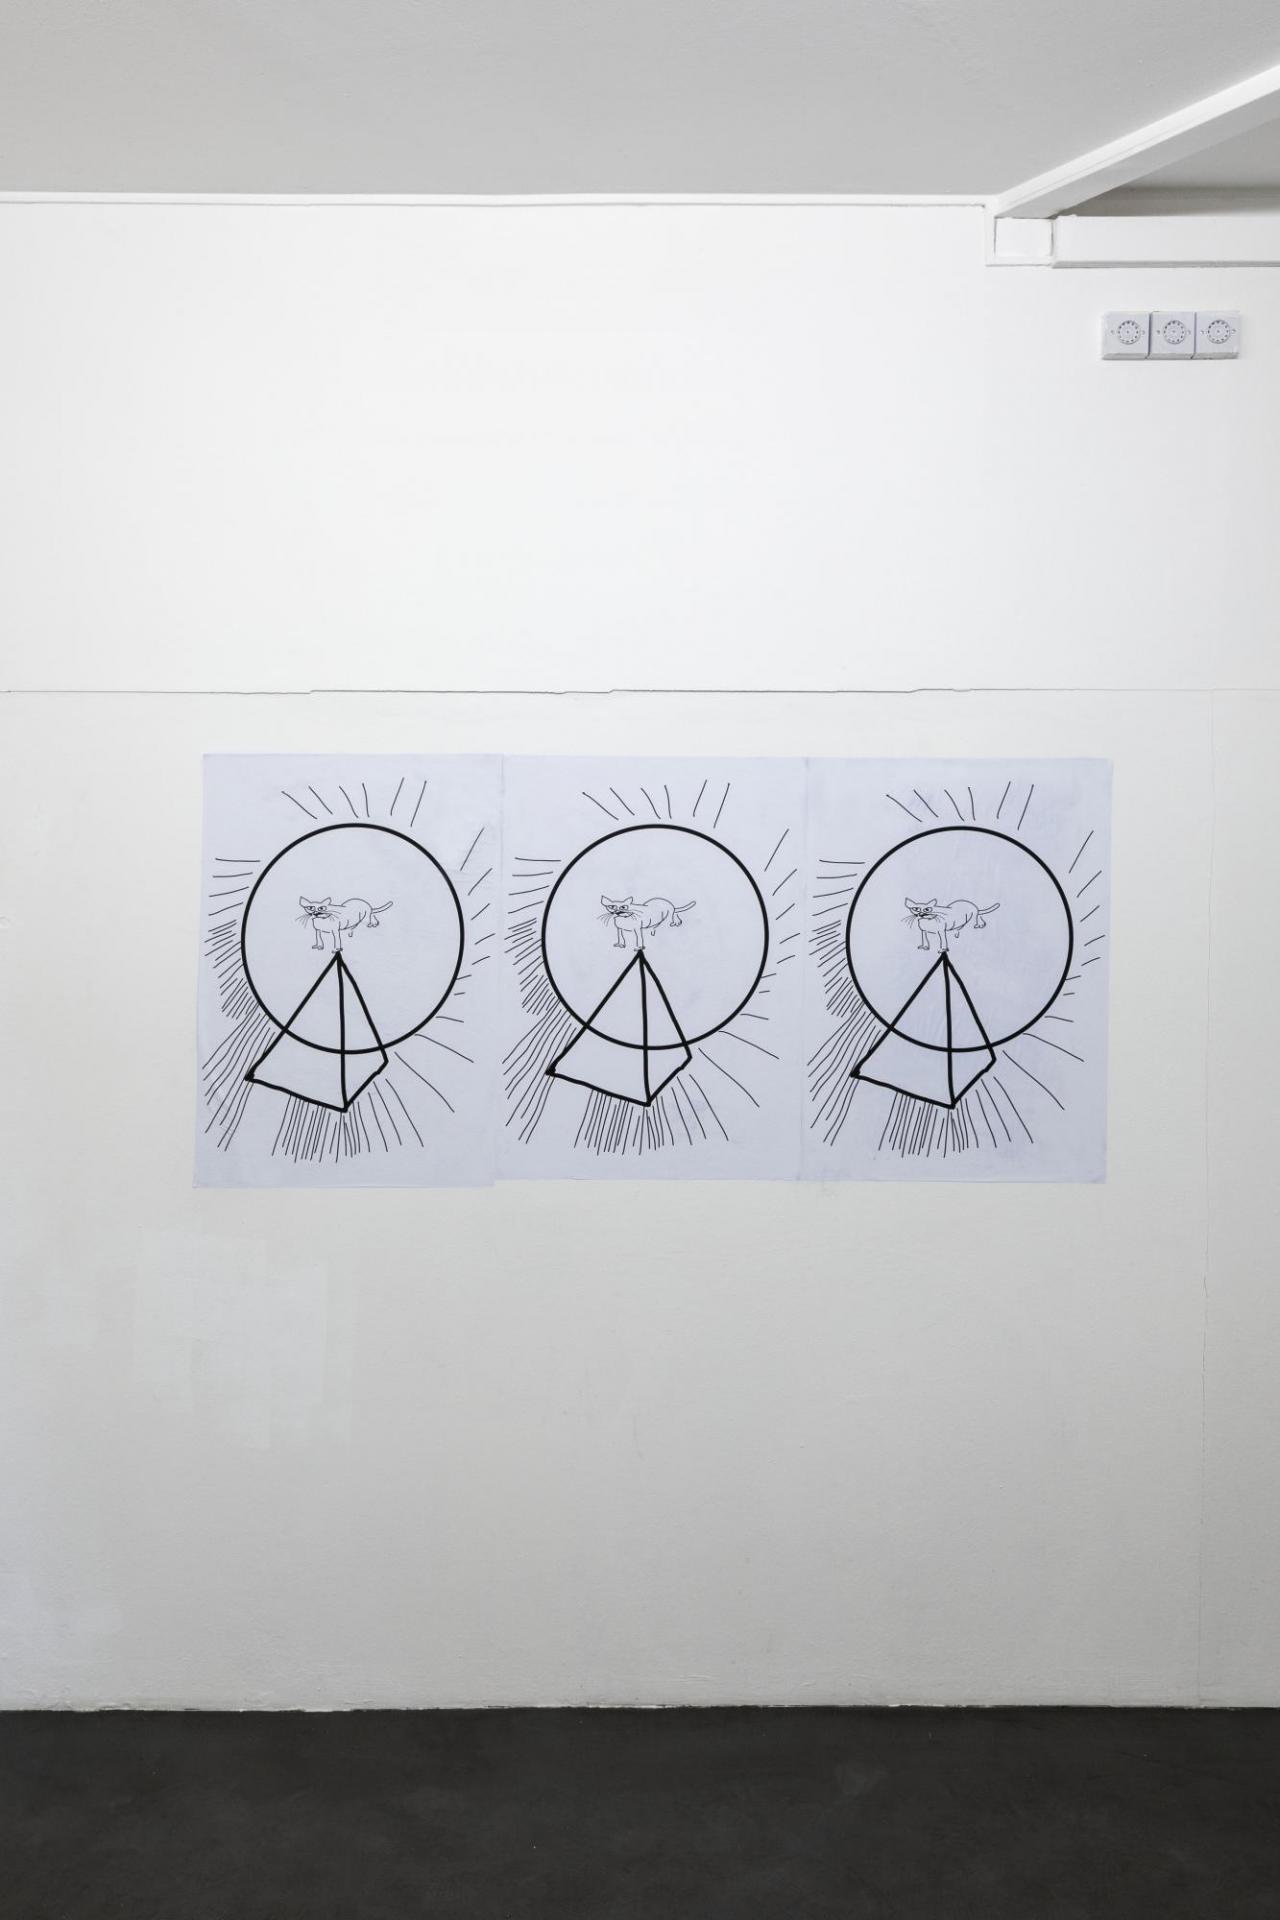 Spike Poster by Rita Vitorelli